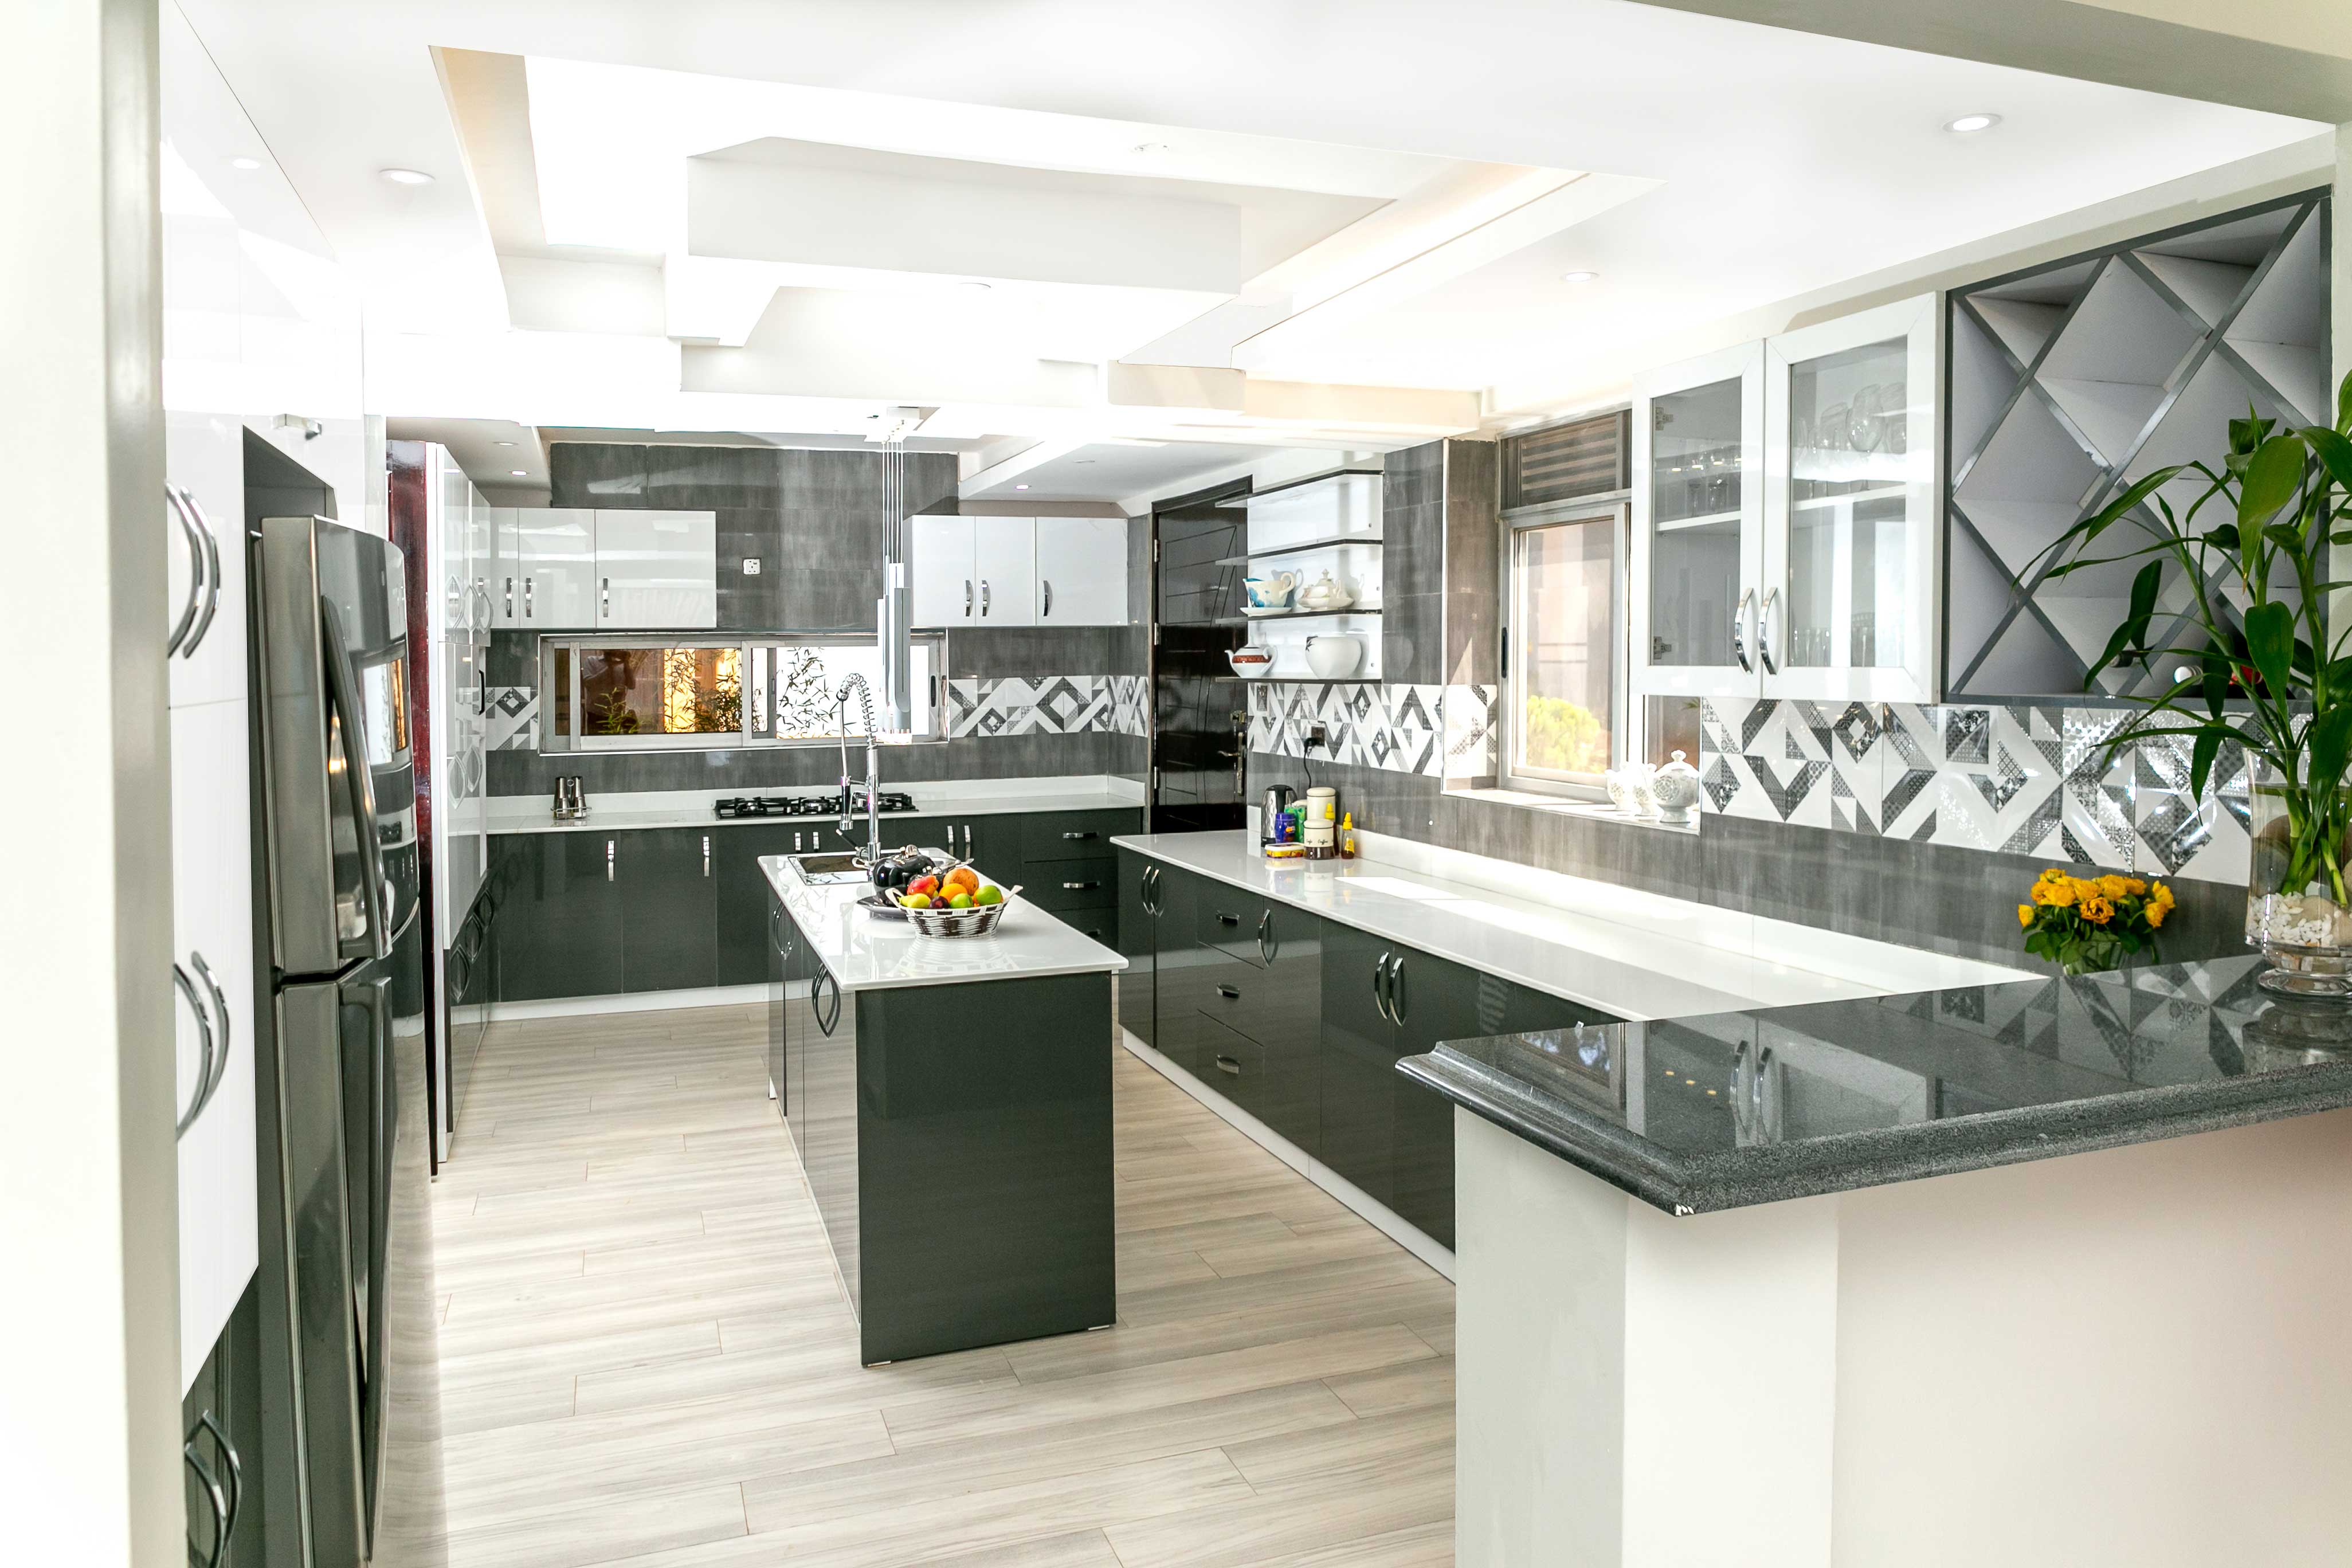 Modino Furniture Modern Quality Kitchen Design Kitchen Cabinet Kitchen Furniture Wardrobe Design And Furniture In Uganda